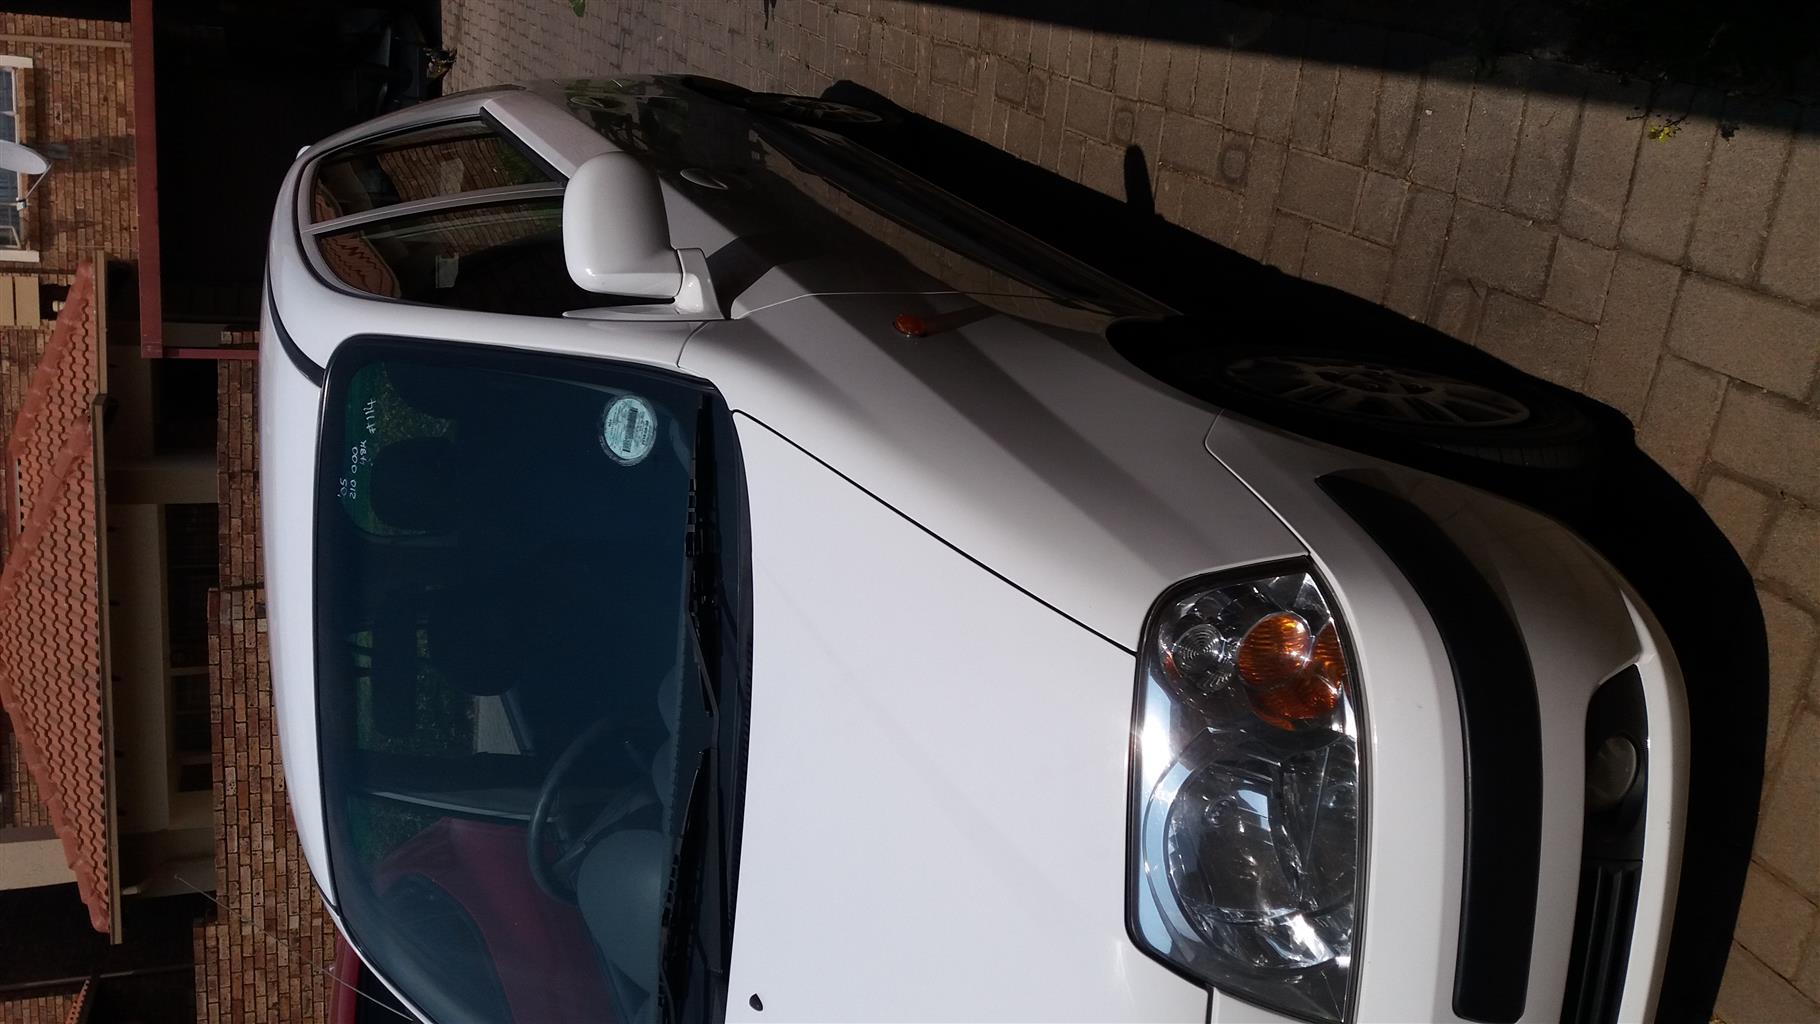 2005 Hyundai Atos